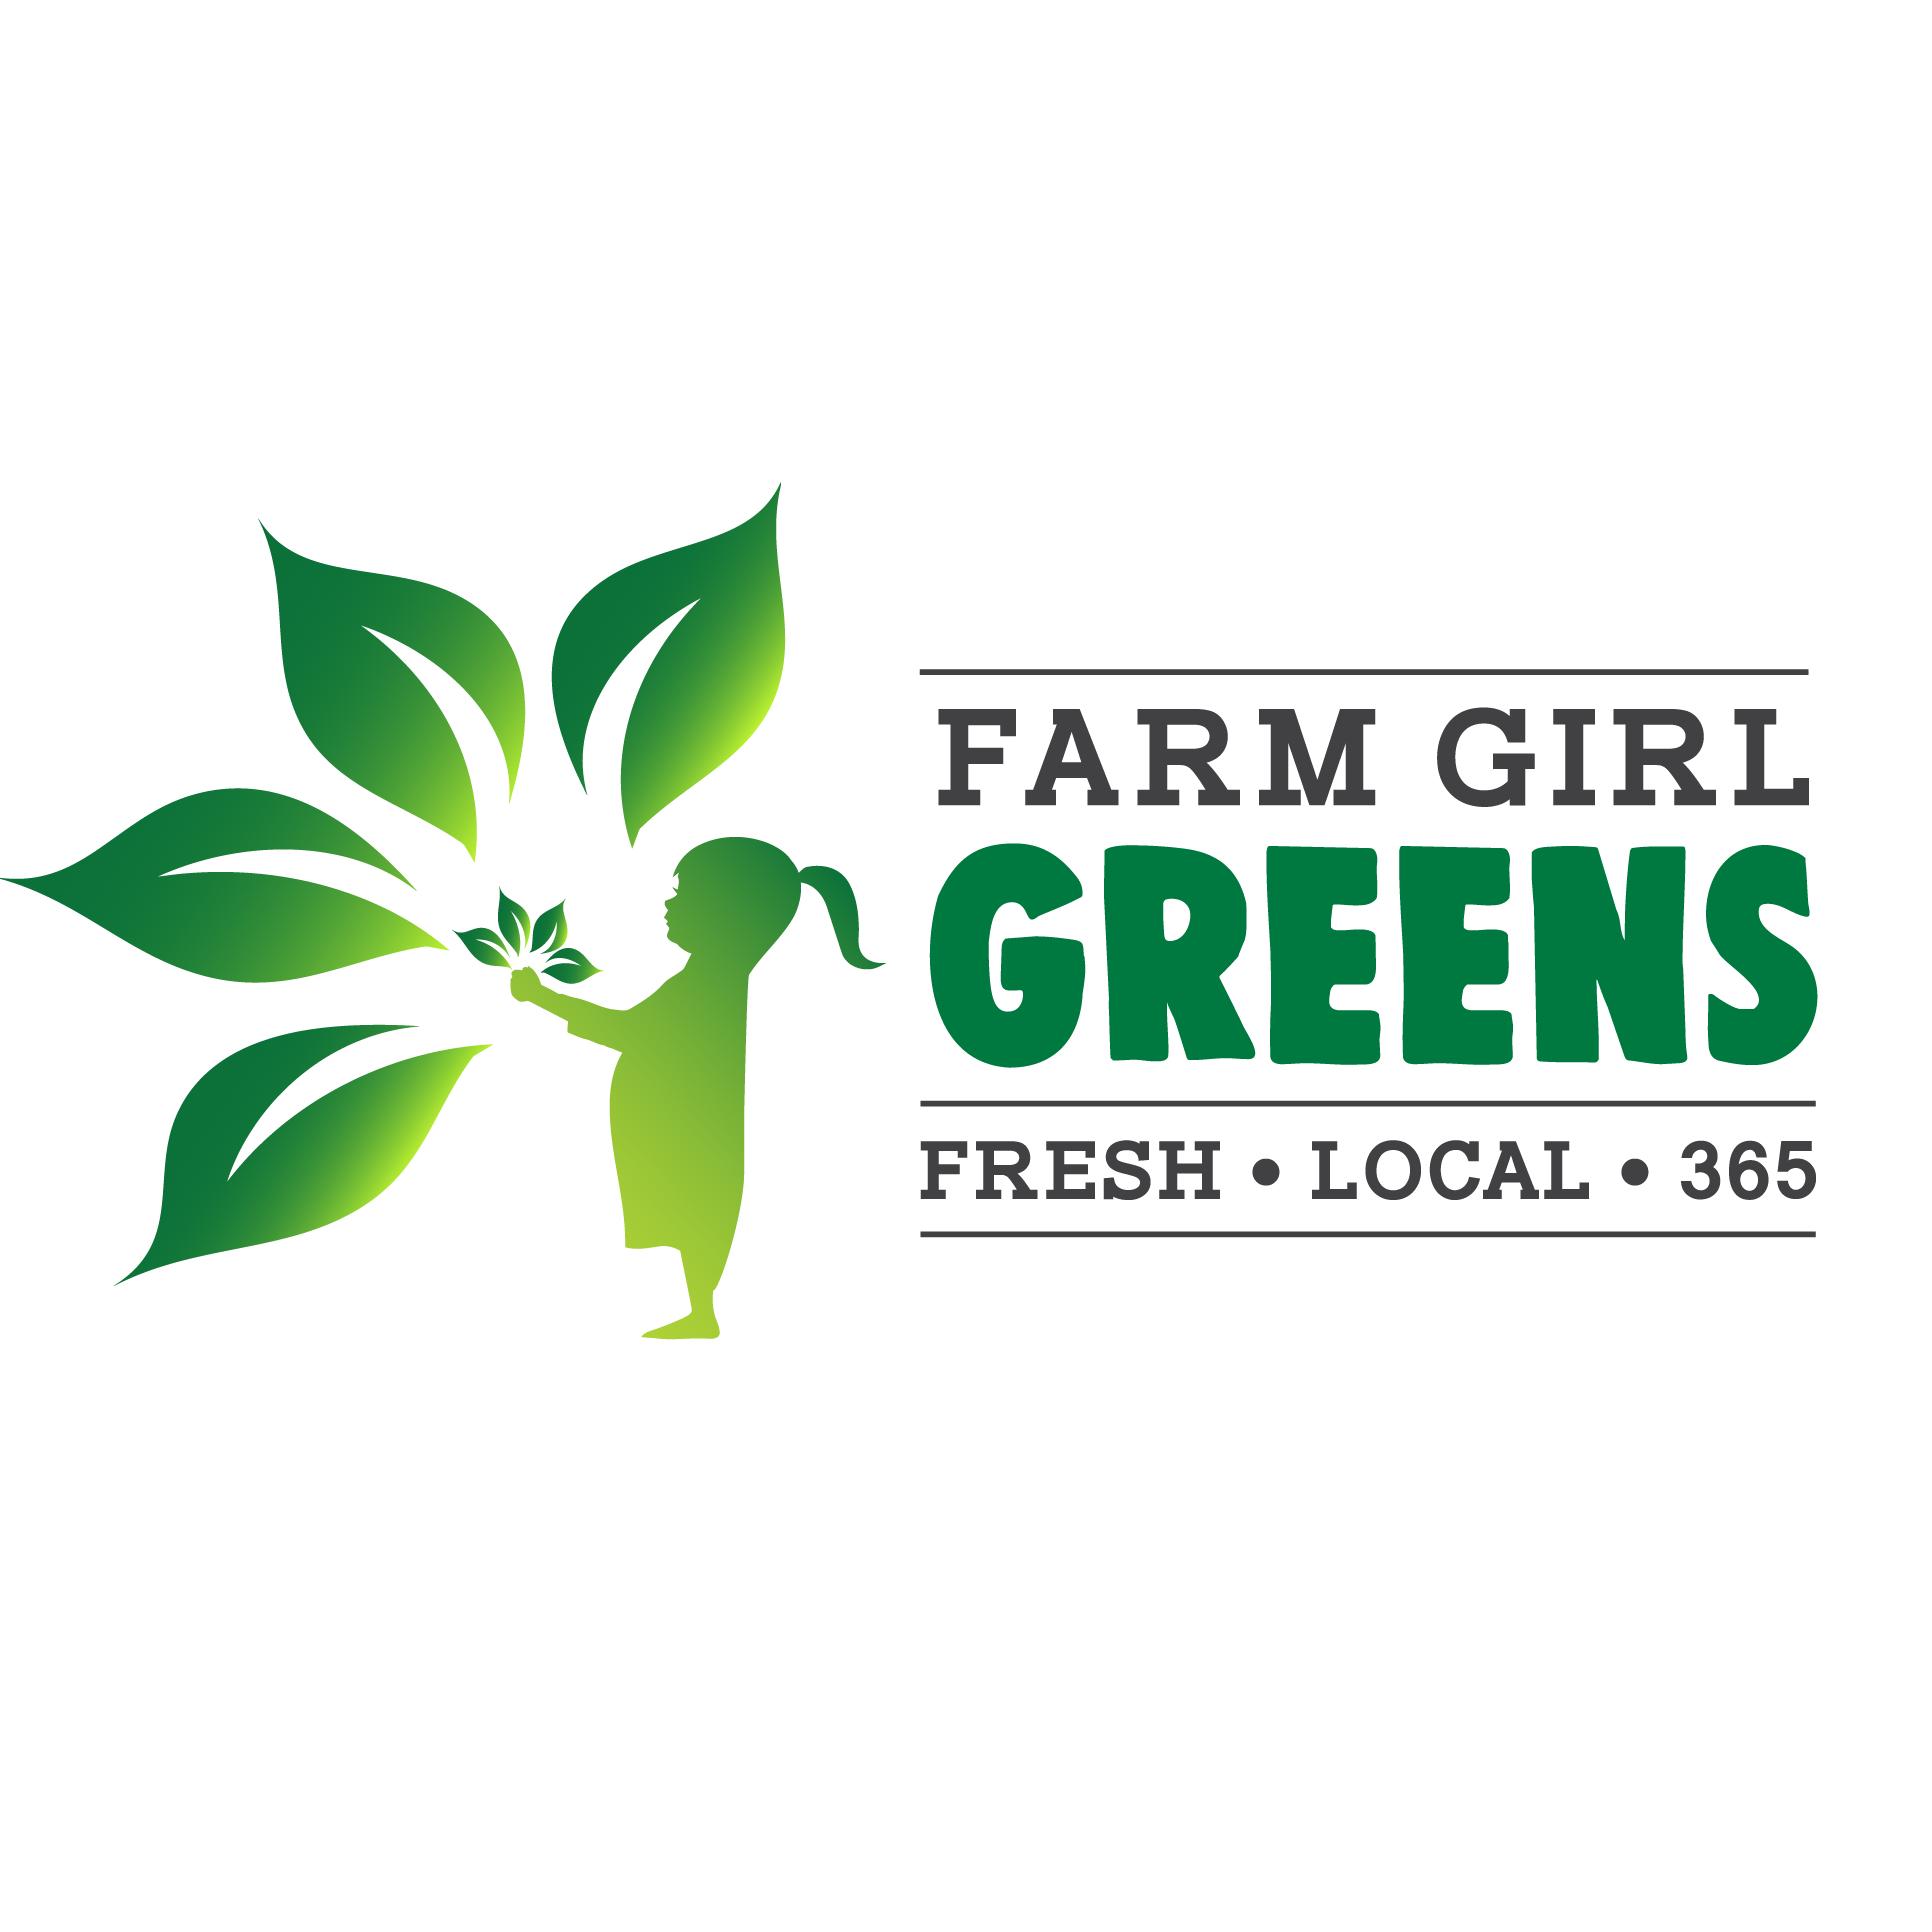 Farm Girl Greens